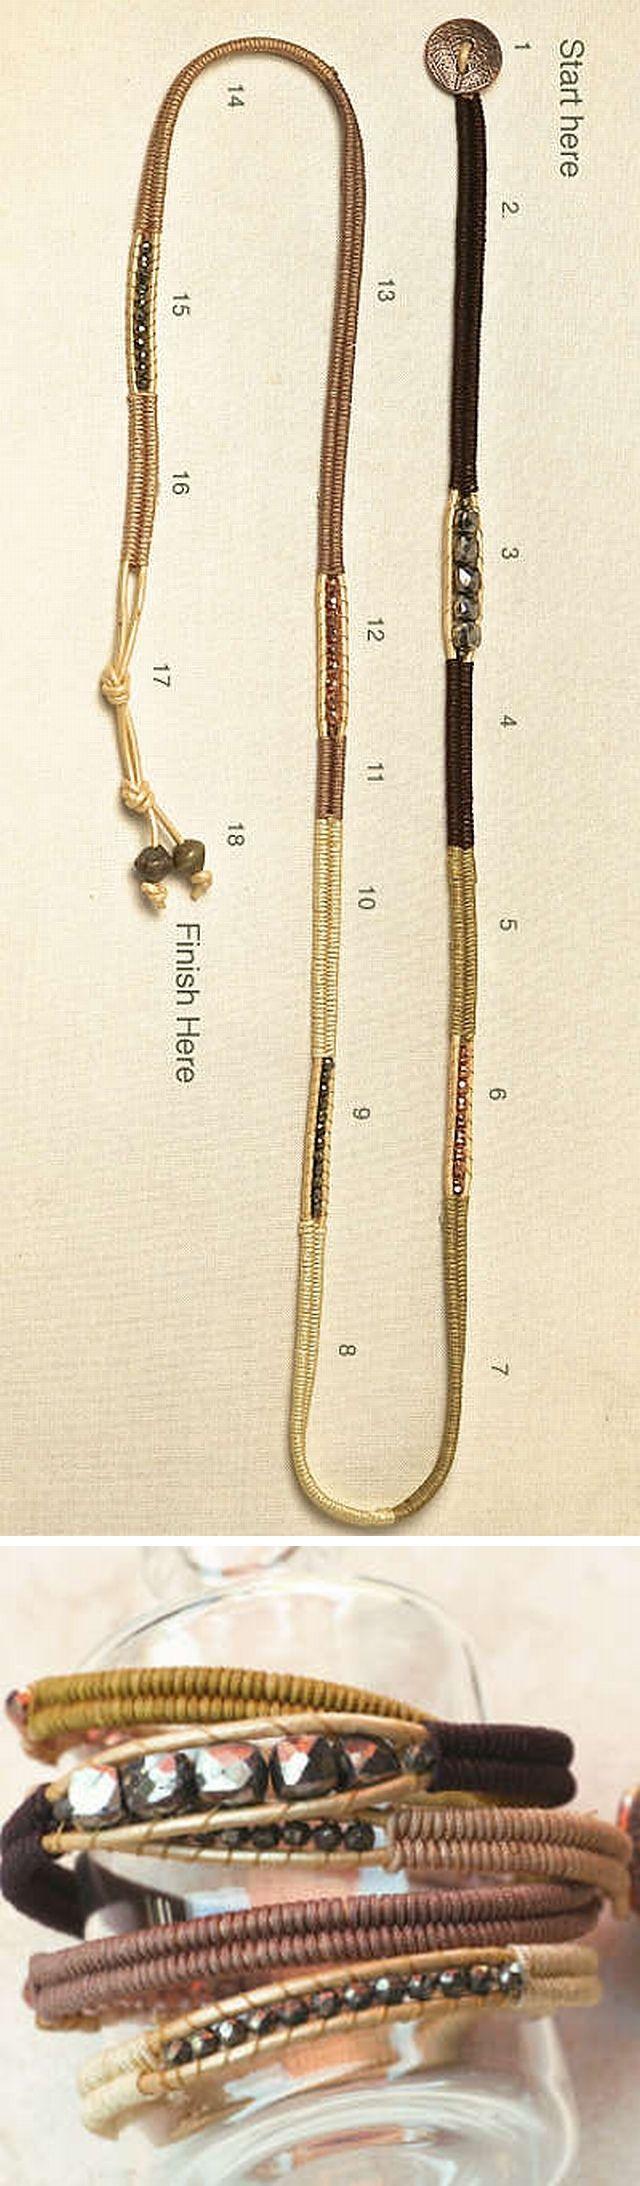 how to add a new thread for herringbone tubular beading